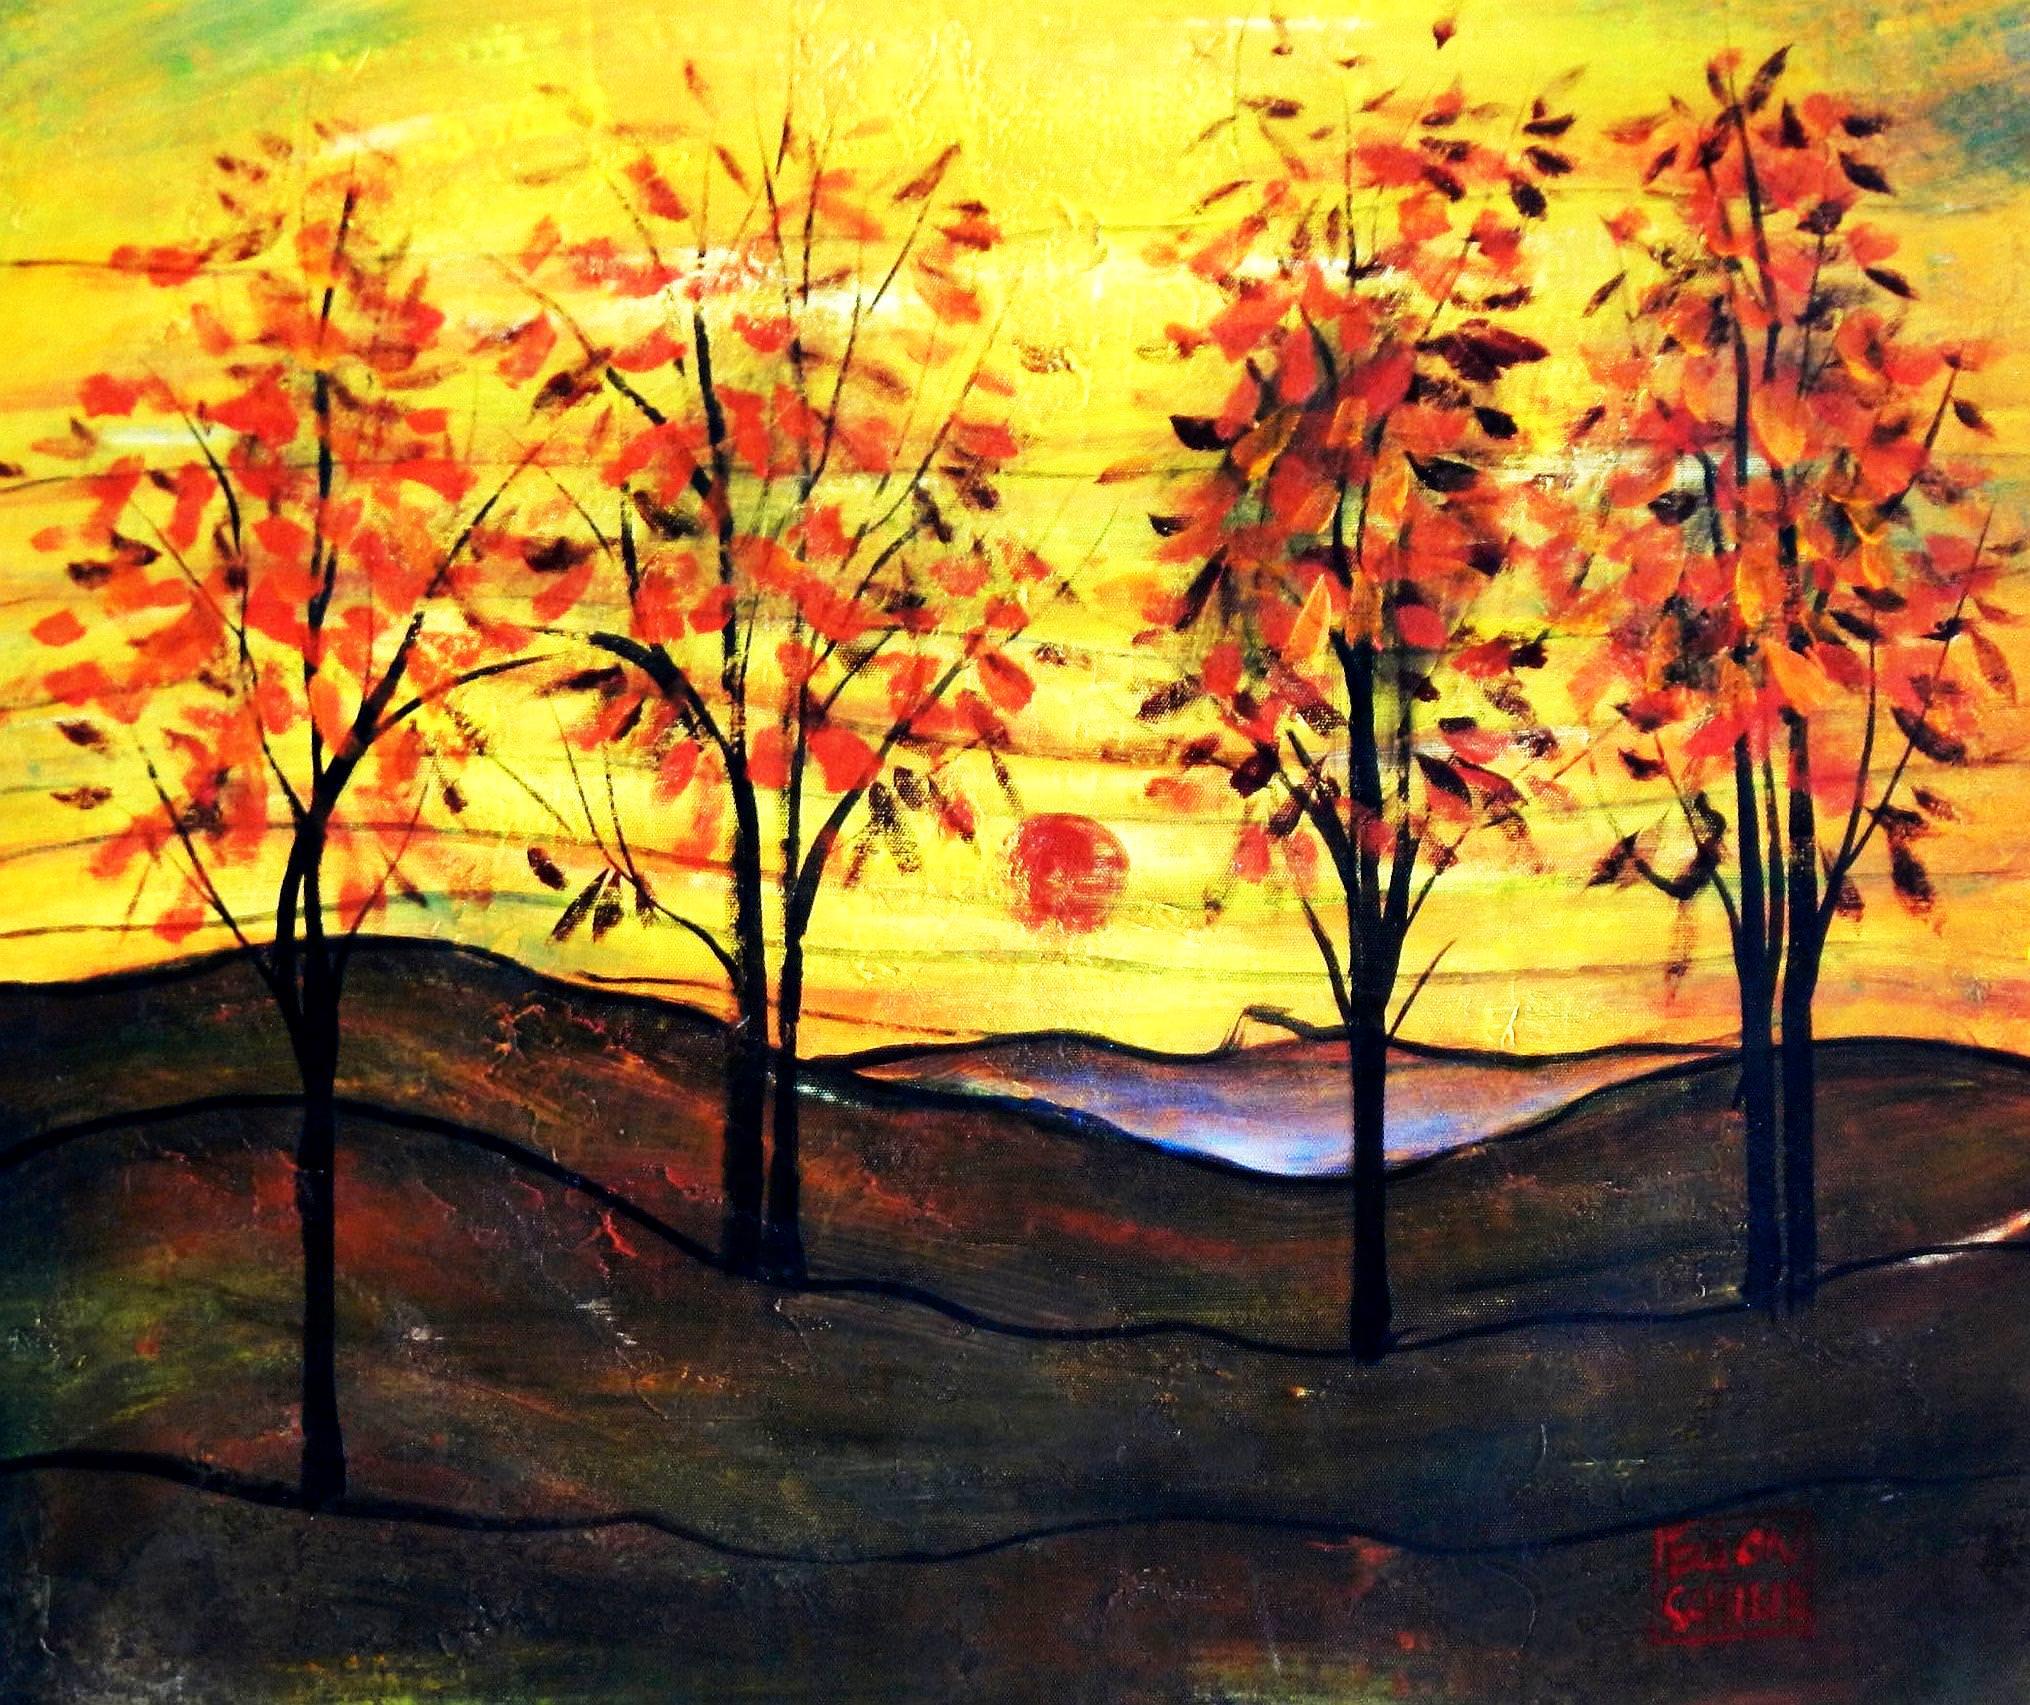 Egon Schiele - Vier Bäume c93903 G 50x60cm exzellentes Ölbild